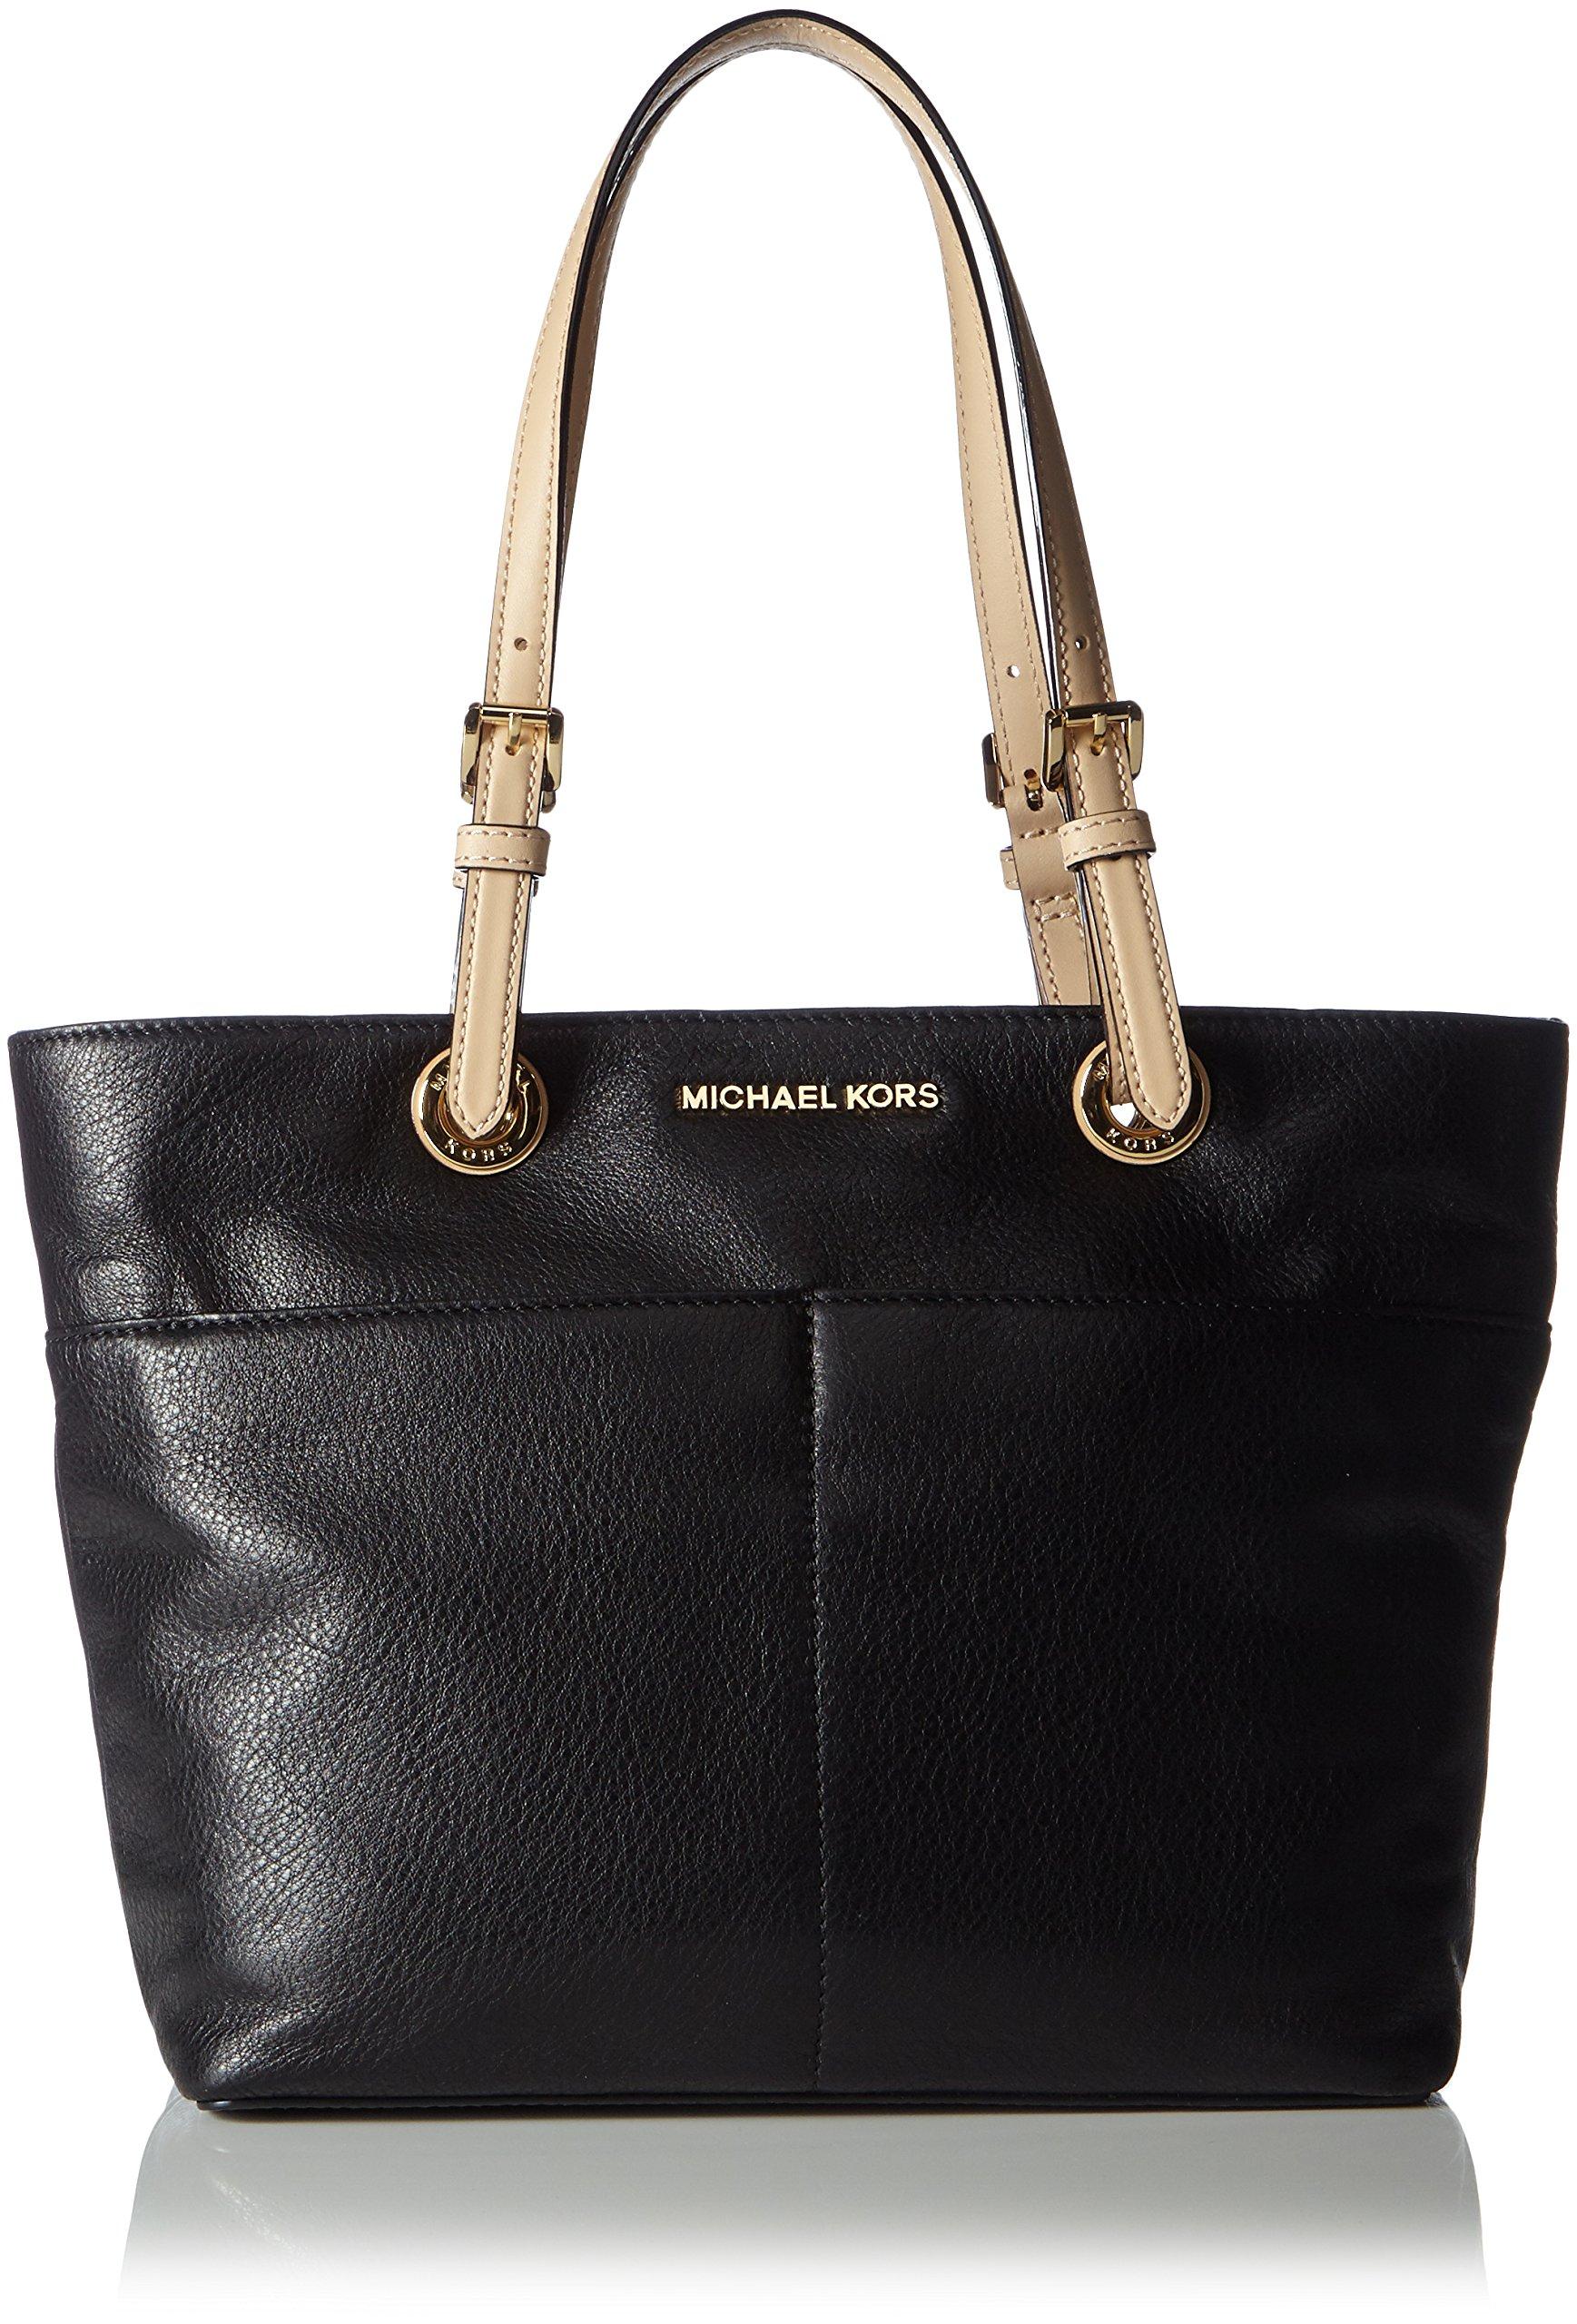 best rated in women s top handle handbags helpful customer reviews rh amazon com